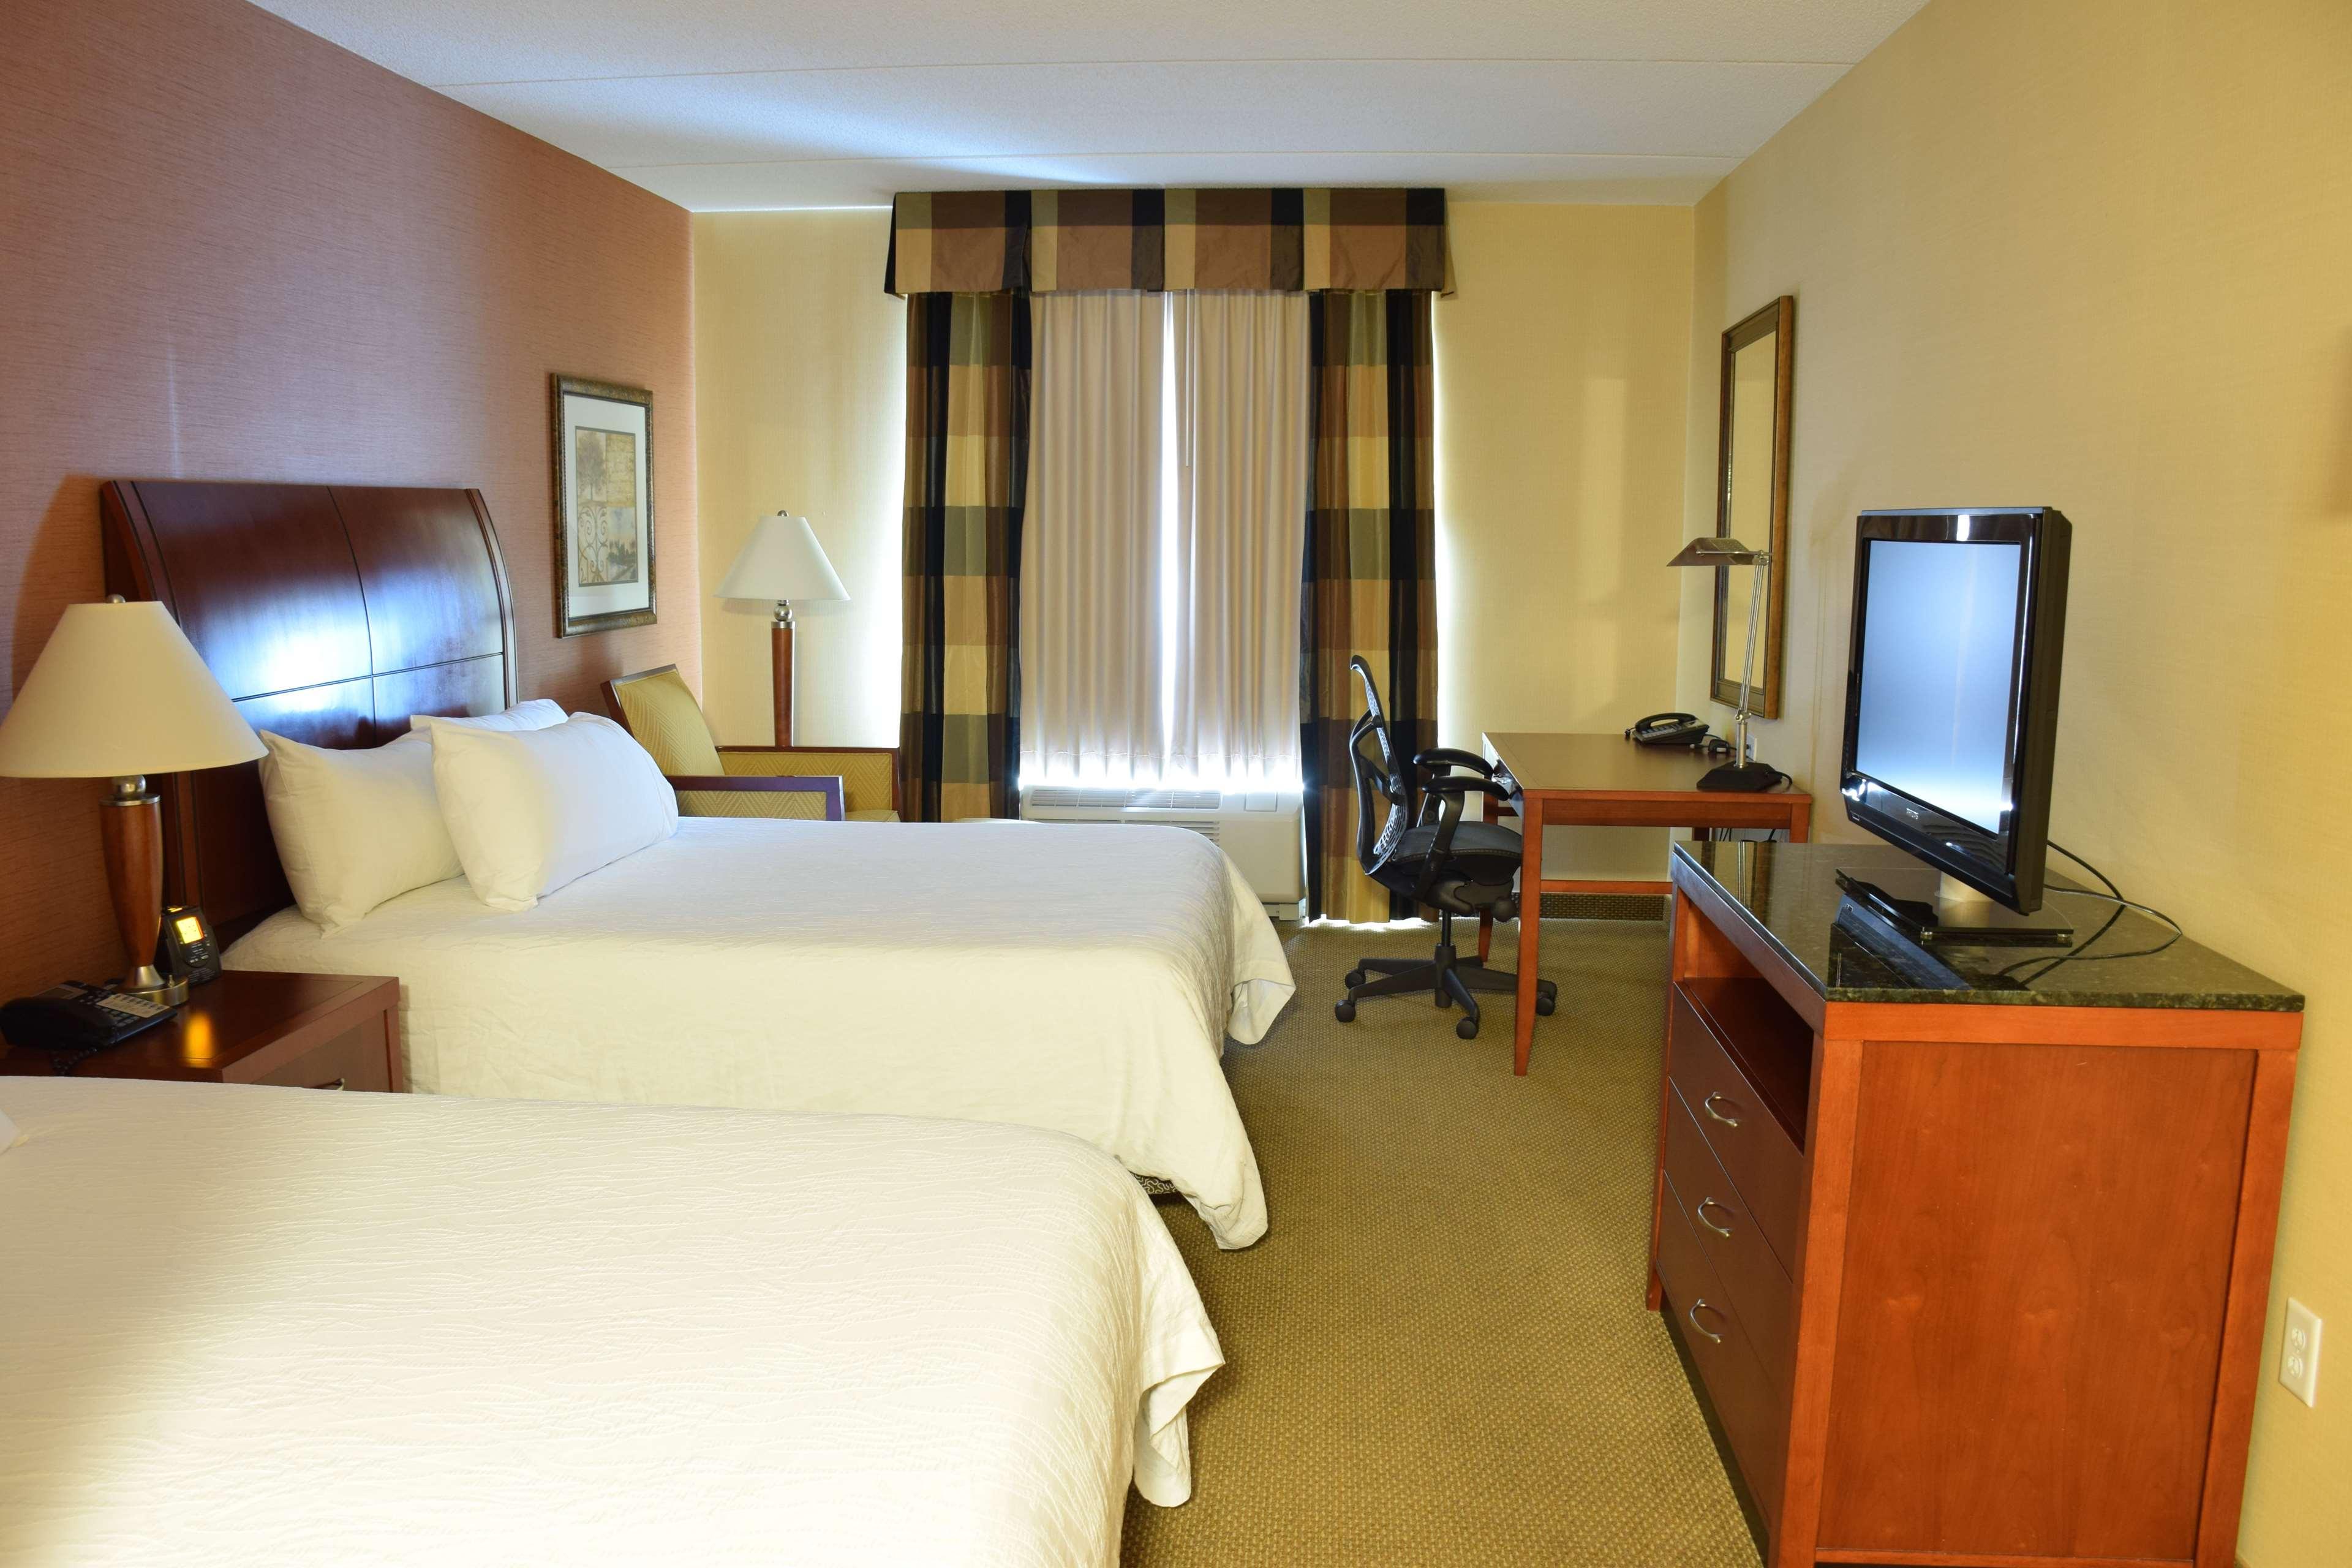 Hilton Garden Inn Dayton Beavercreek image 20